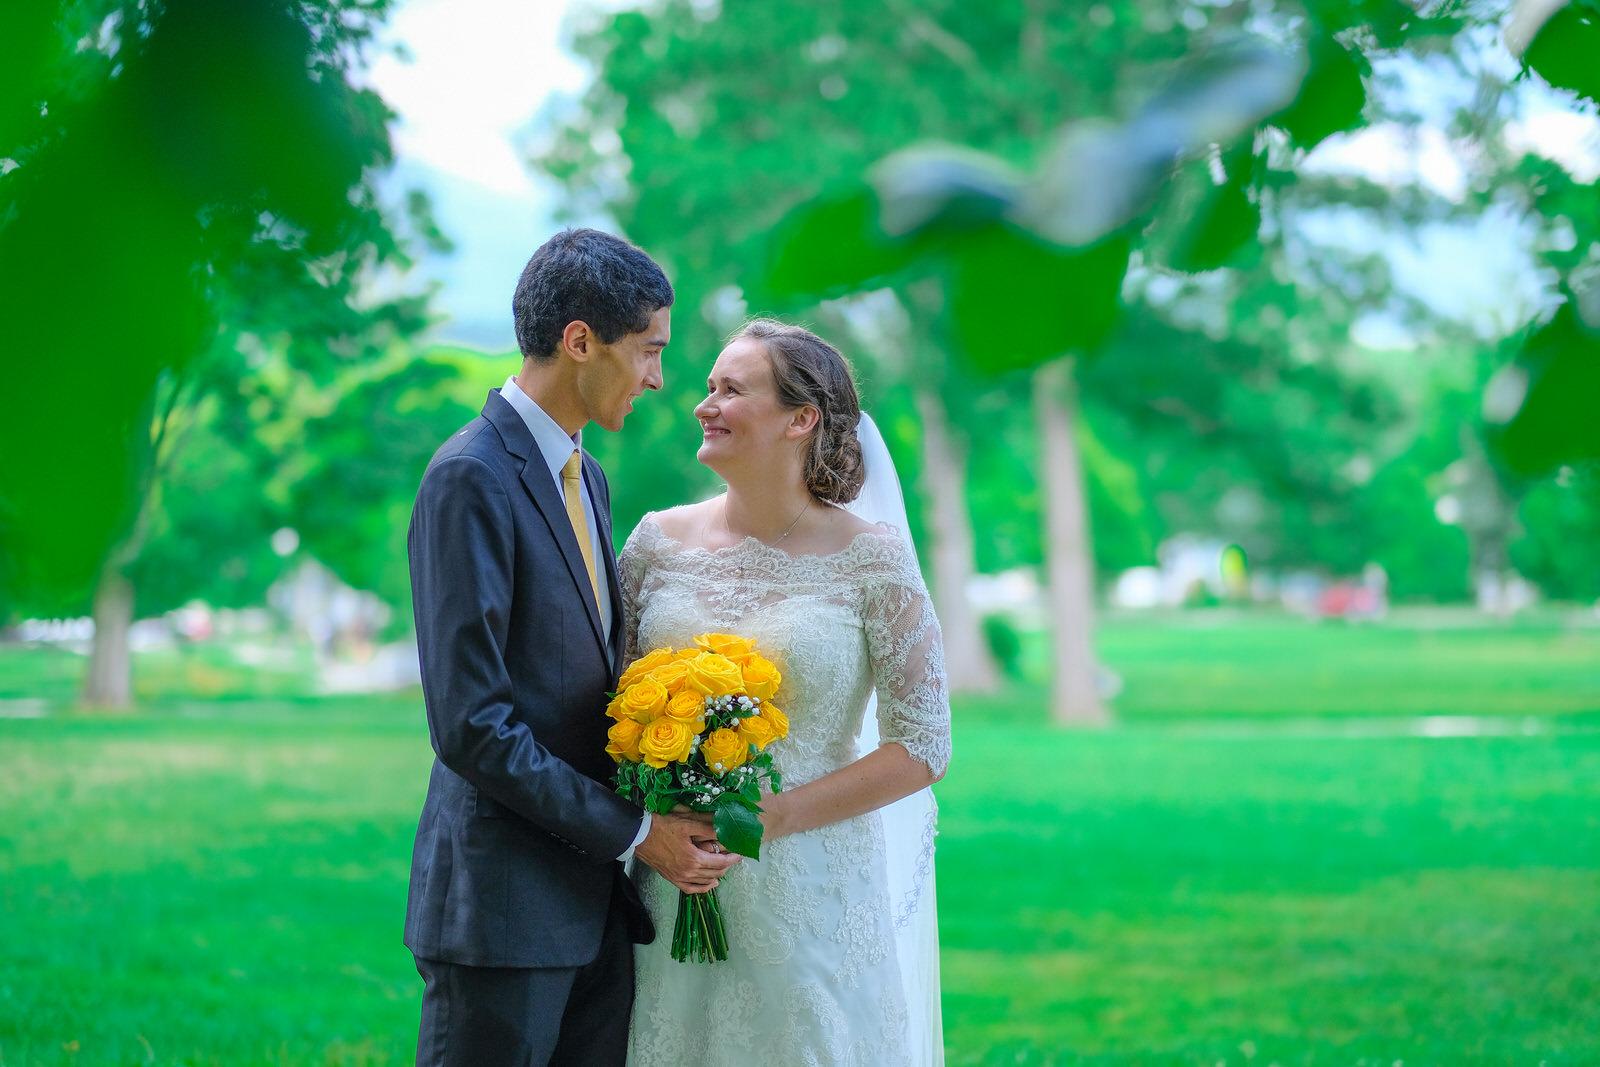 candid-vermont-wedding-photography-906.jpg